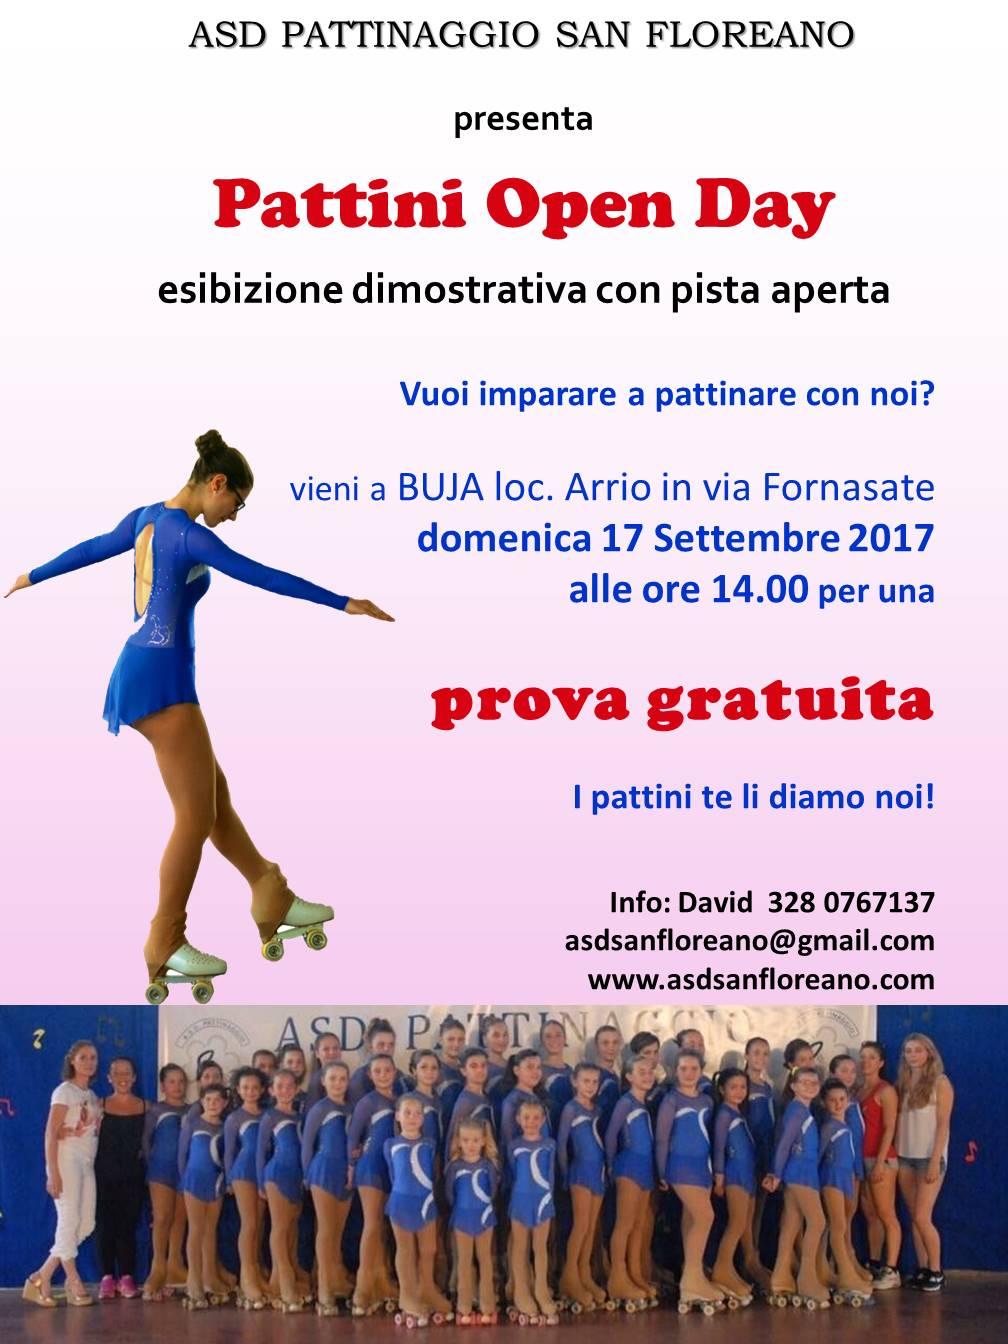 Pattini Open Day 2017